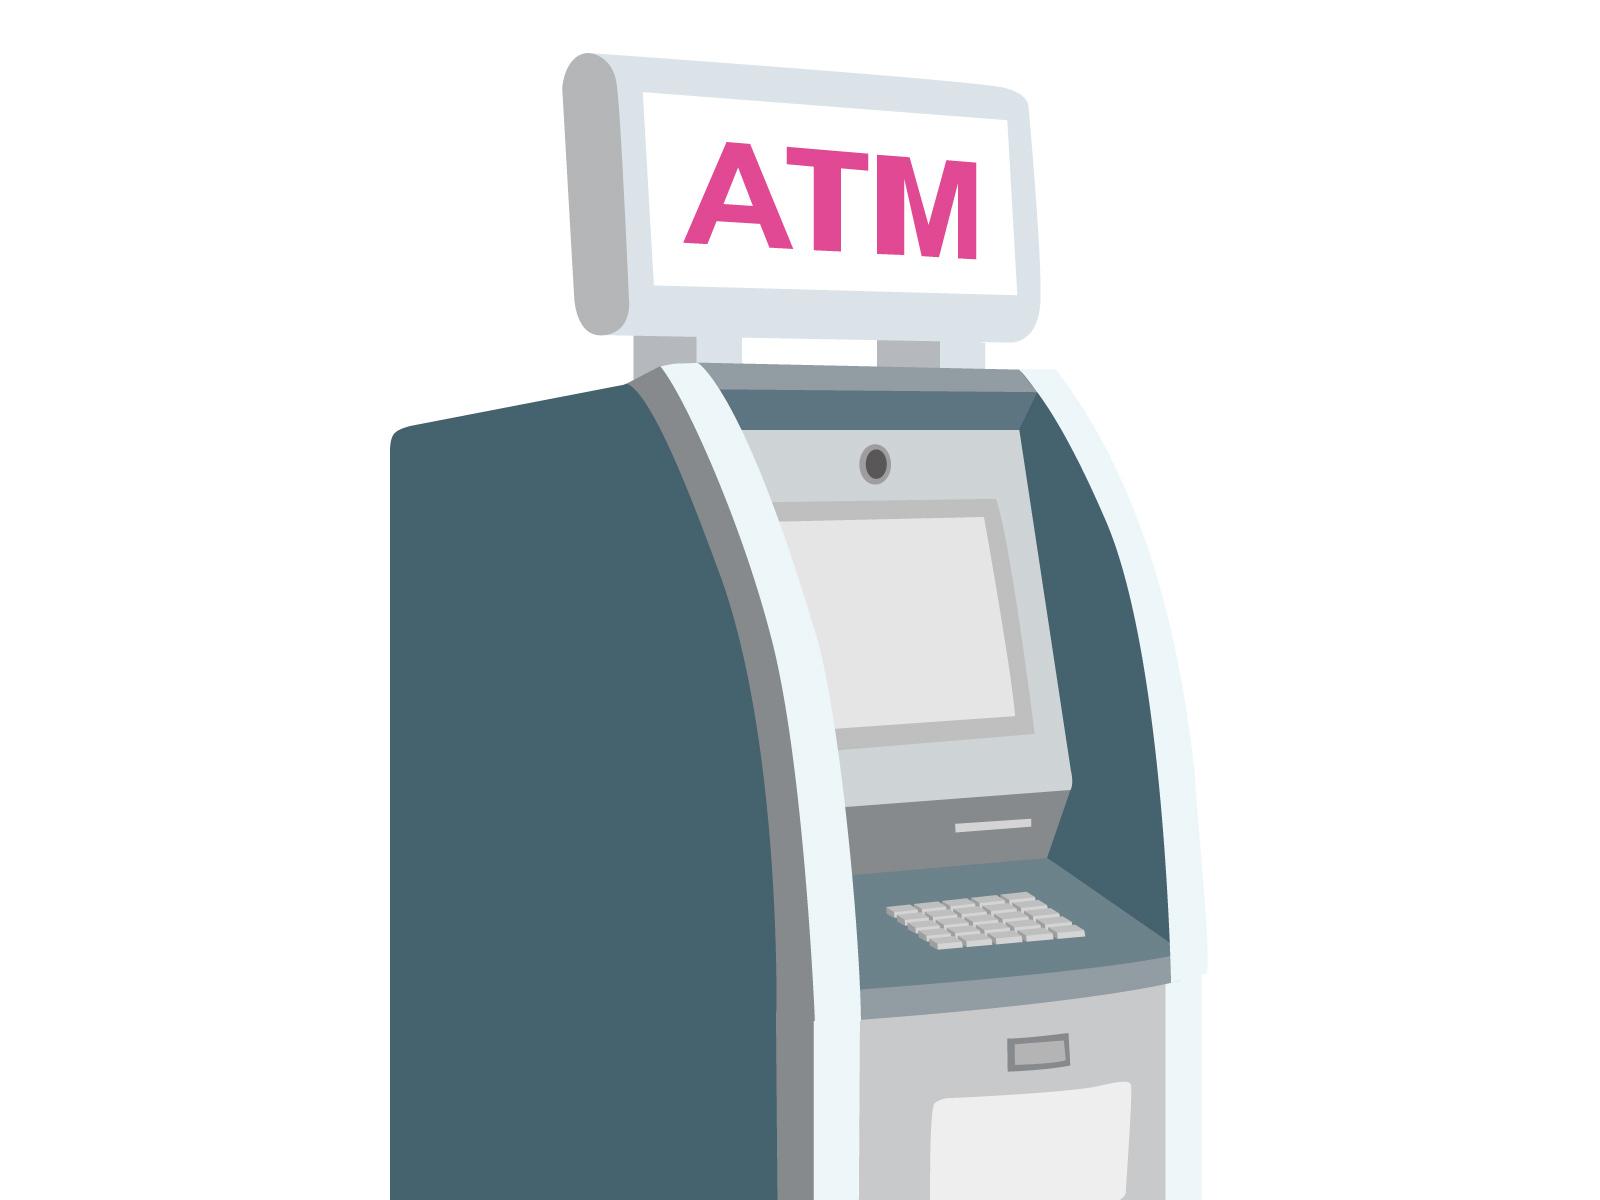 atm_bank_osaka.jpg